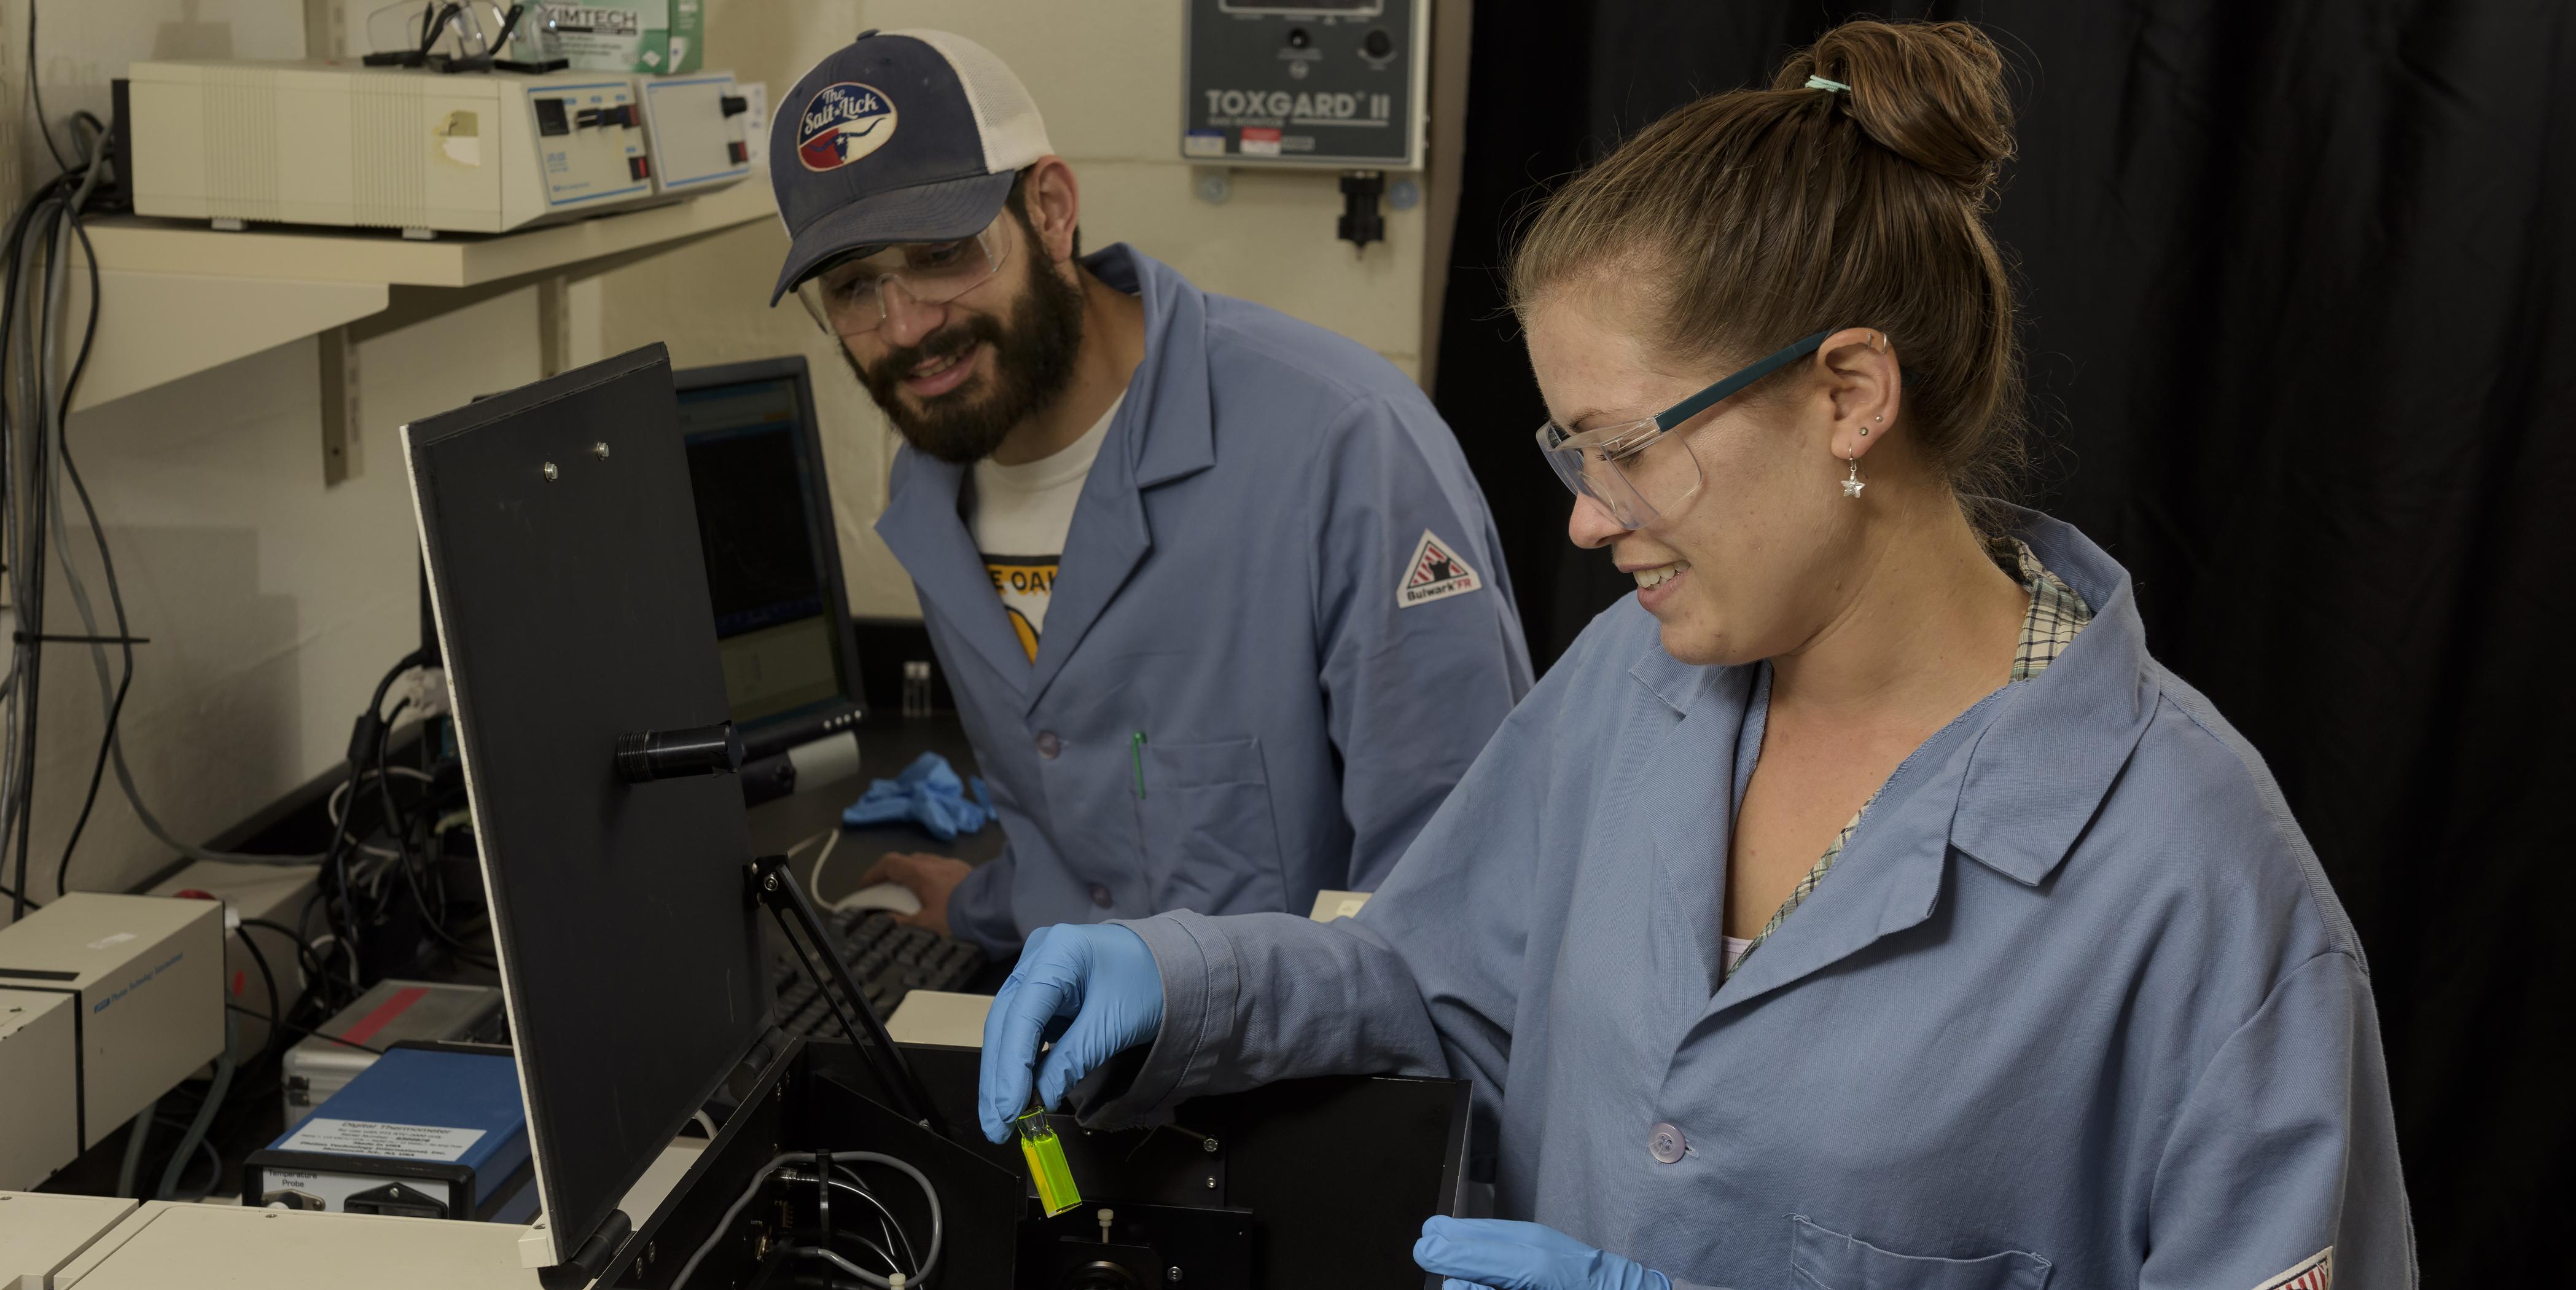 Chemistry - Joel Rosenthal's Lab